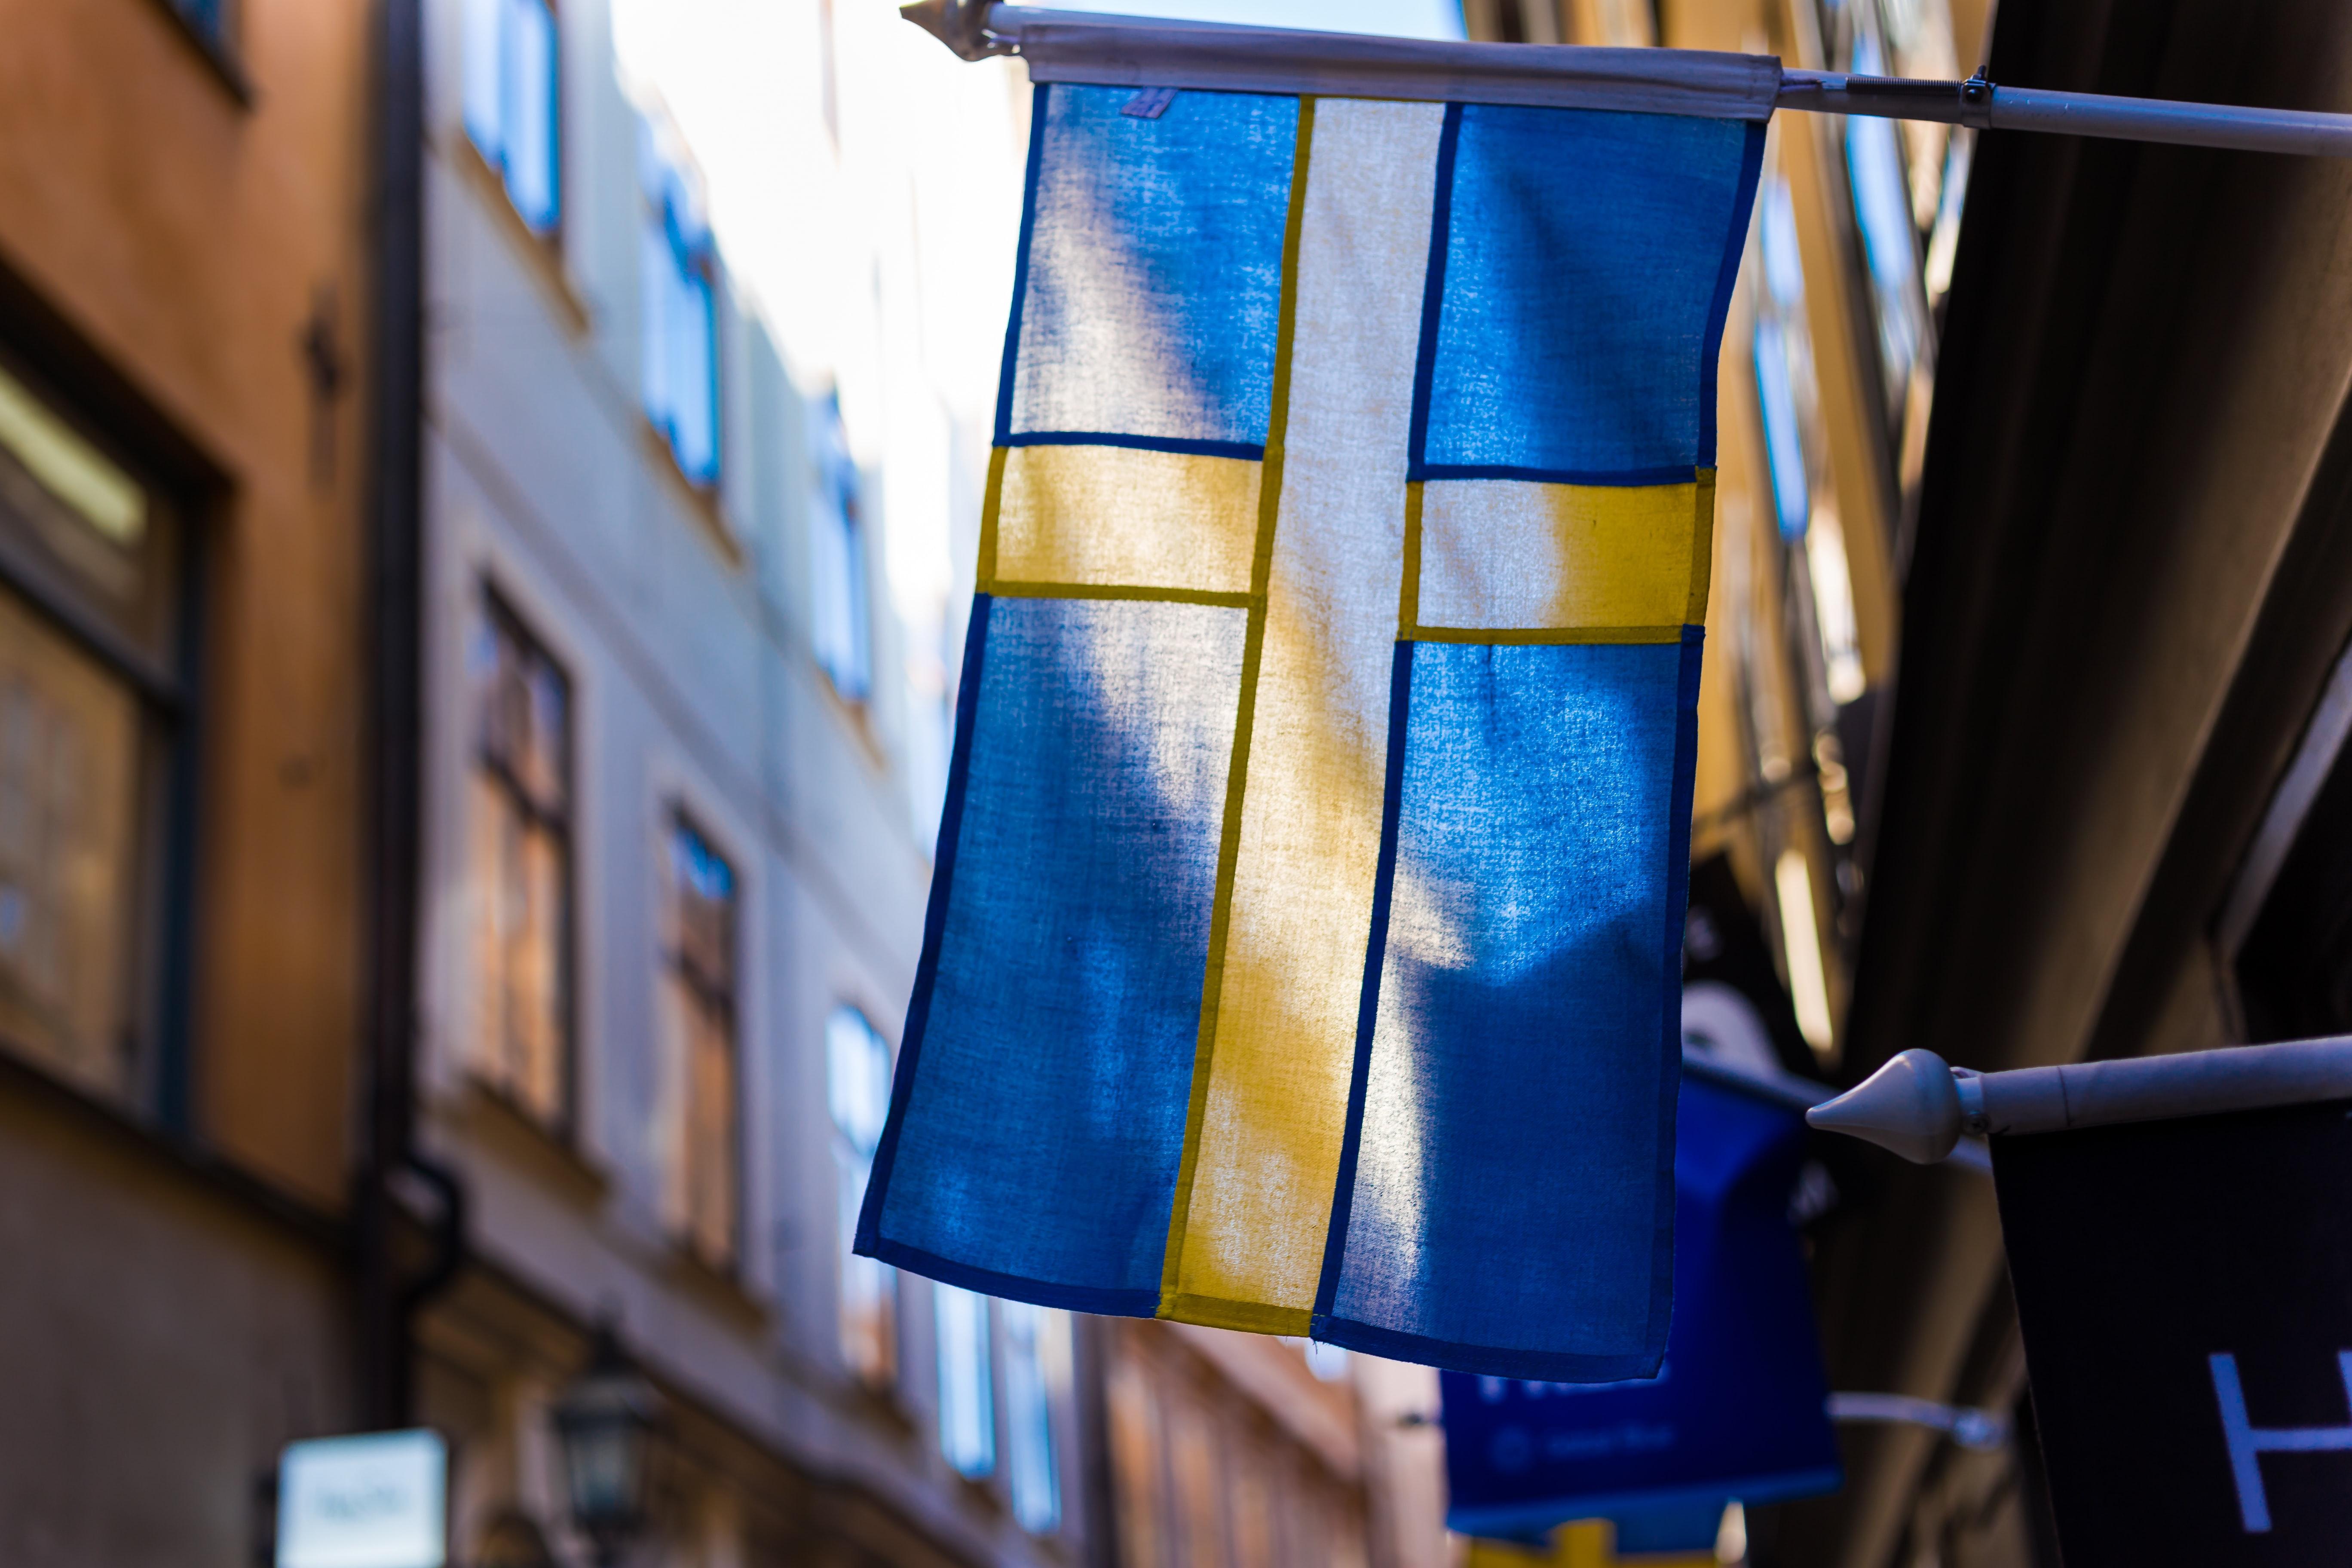 Шведские символы. Tre kronor и шведский флаг